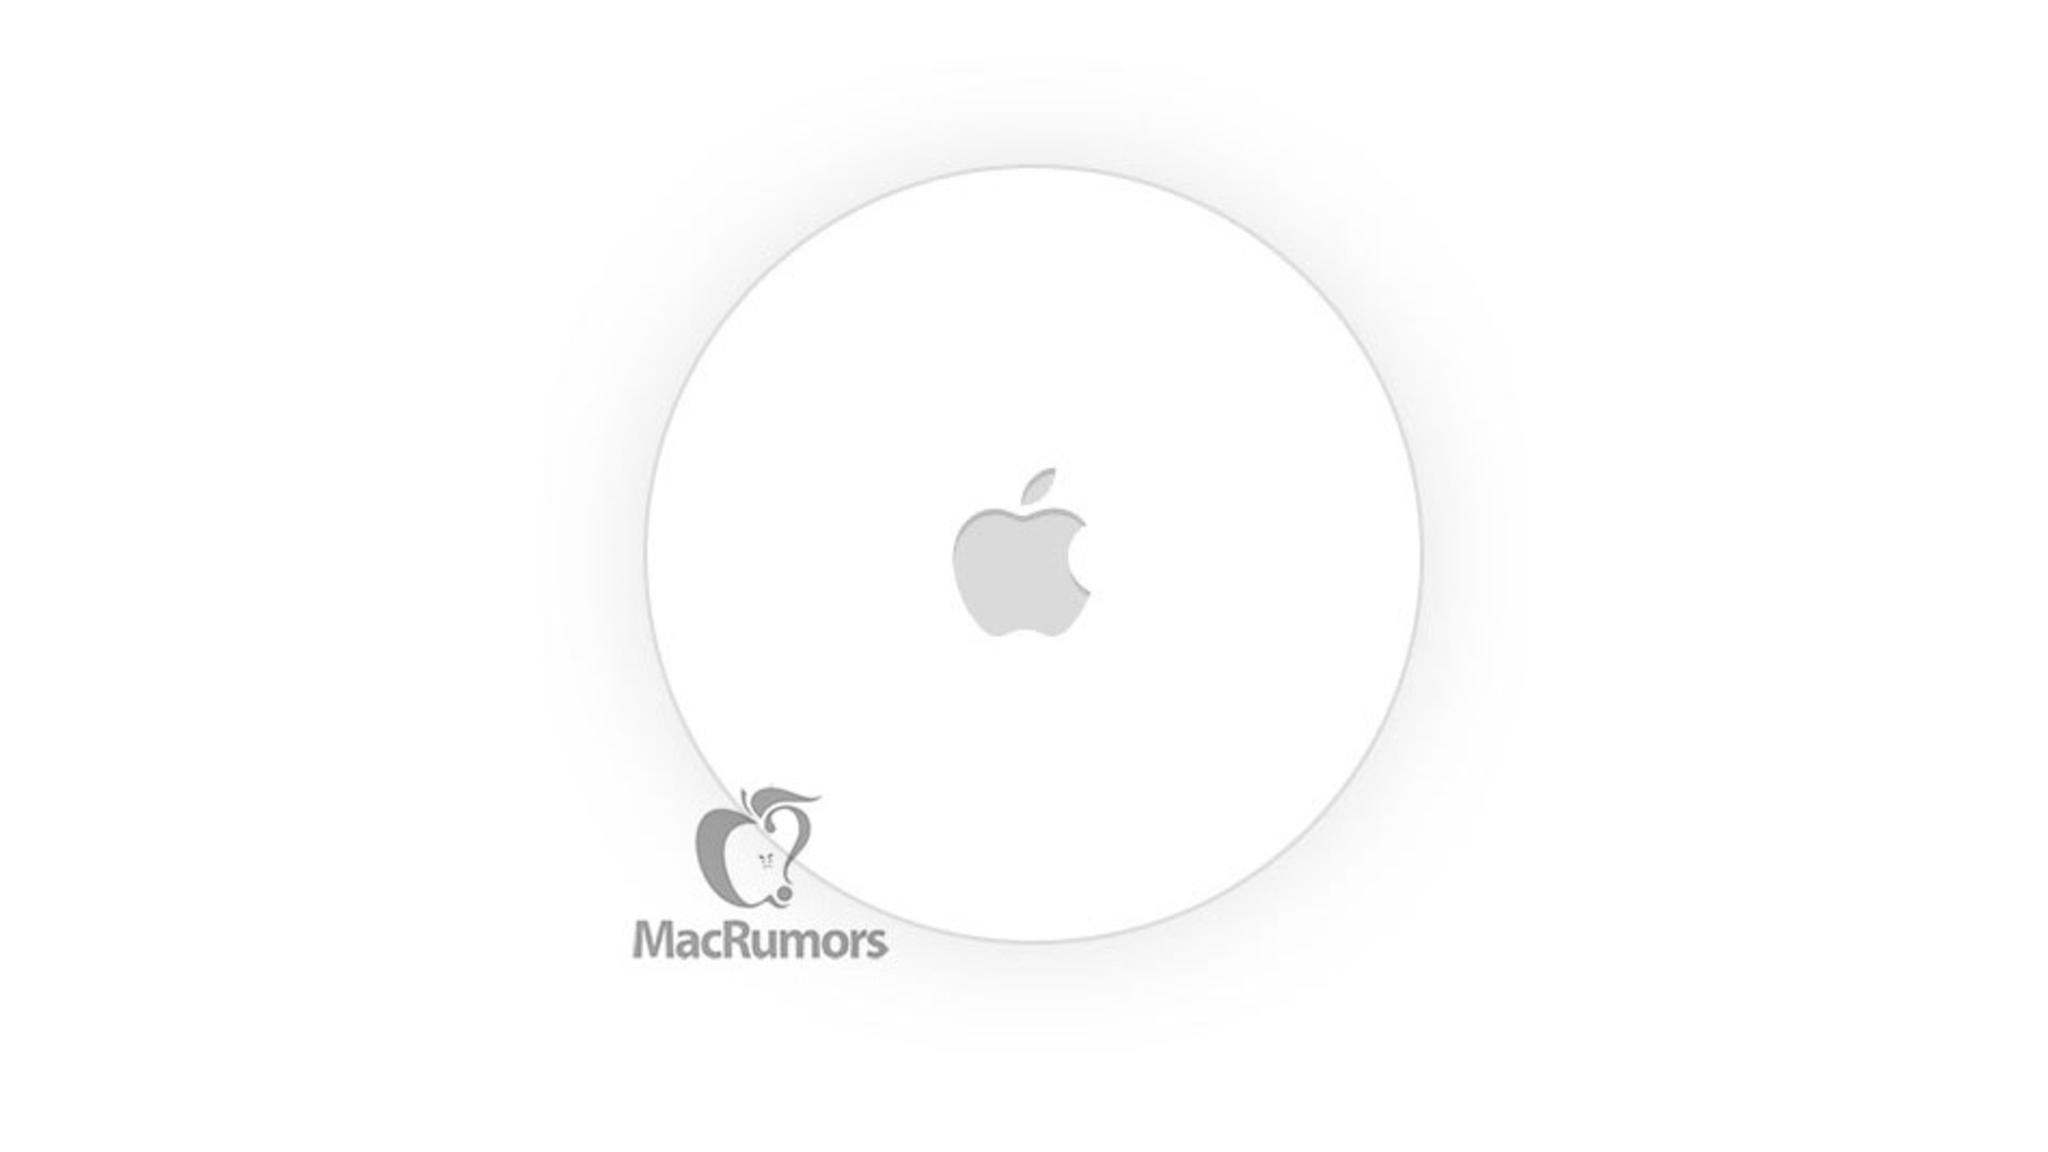 apple-bt-tracker